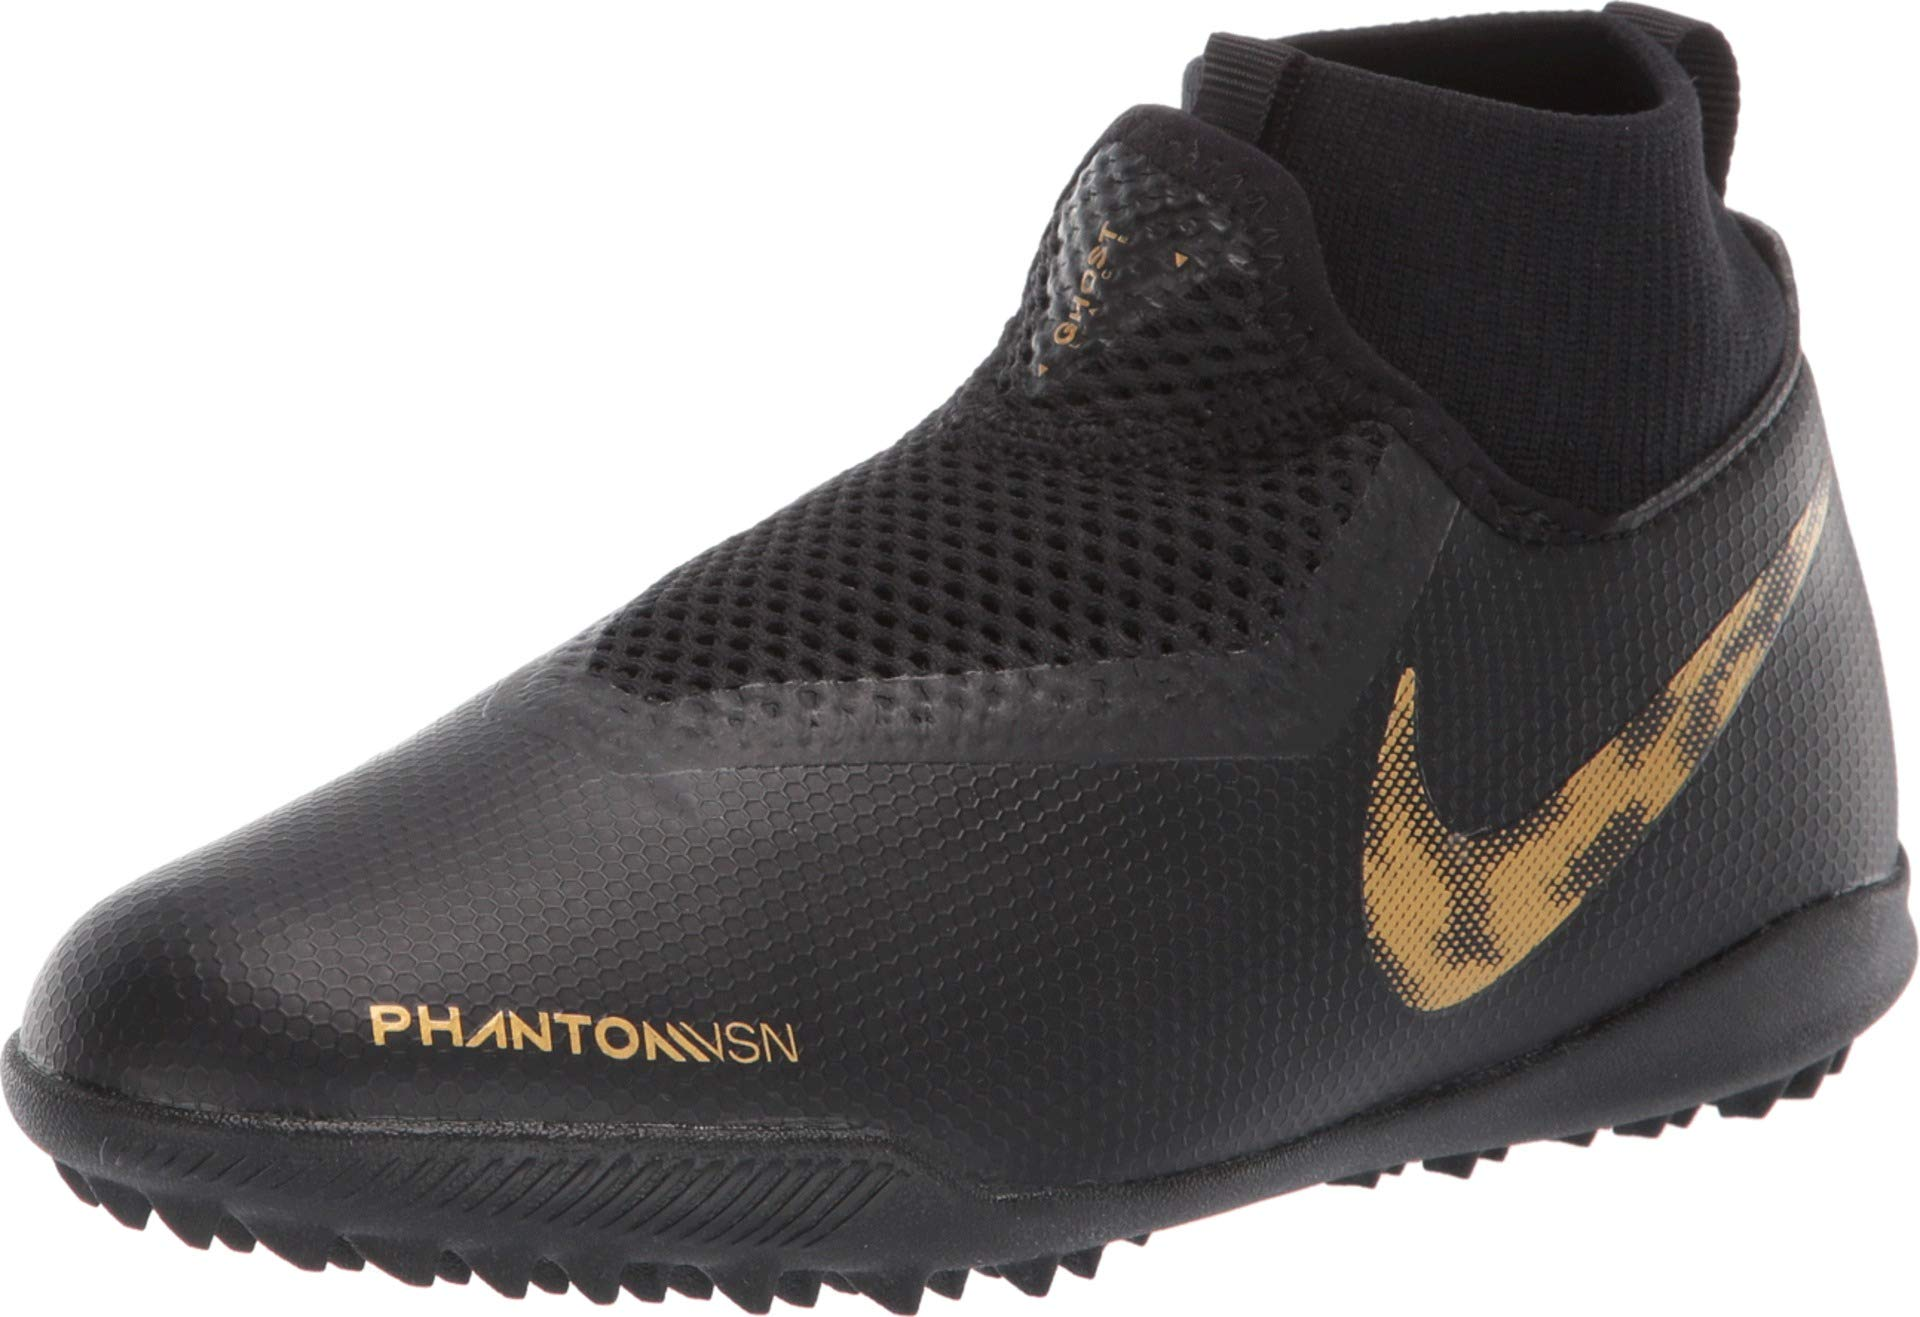 Nike Youth Phantom Vision Academy Dynamic Fit Turf Soccer Cleats-Black-Gold (6Y)